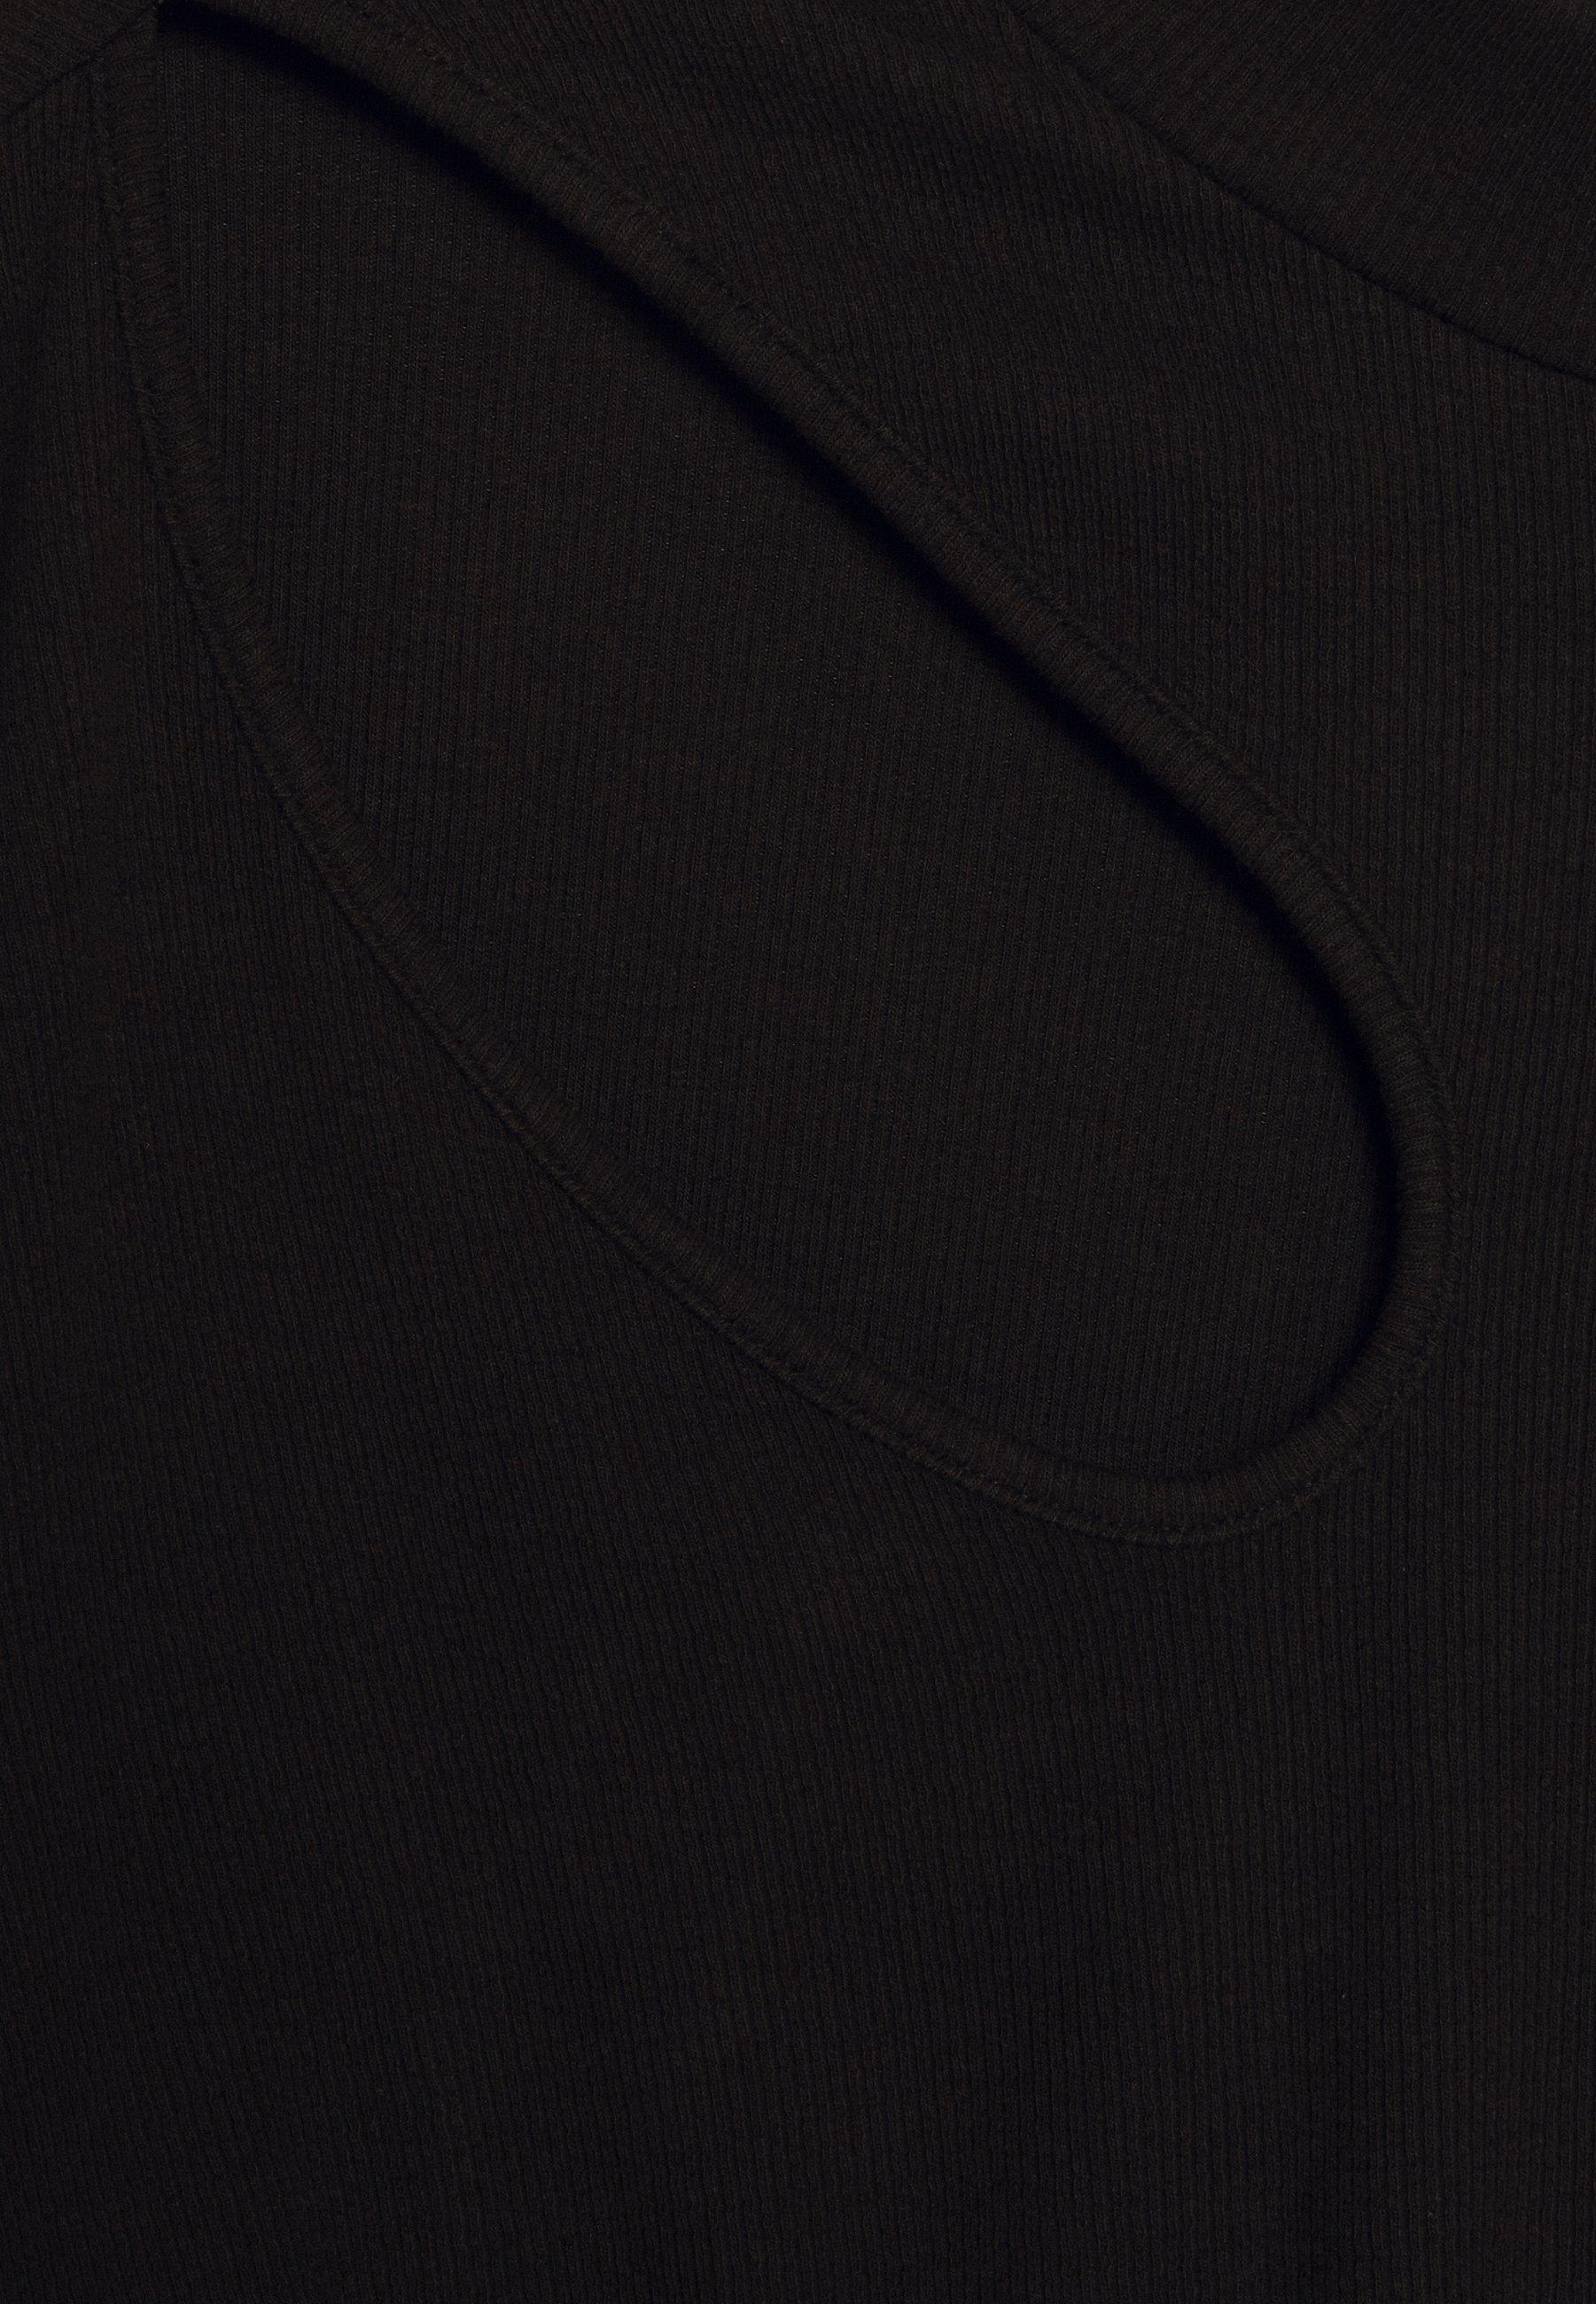 Even&odd Curvy Topper Langermet - Black/svart